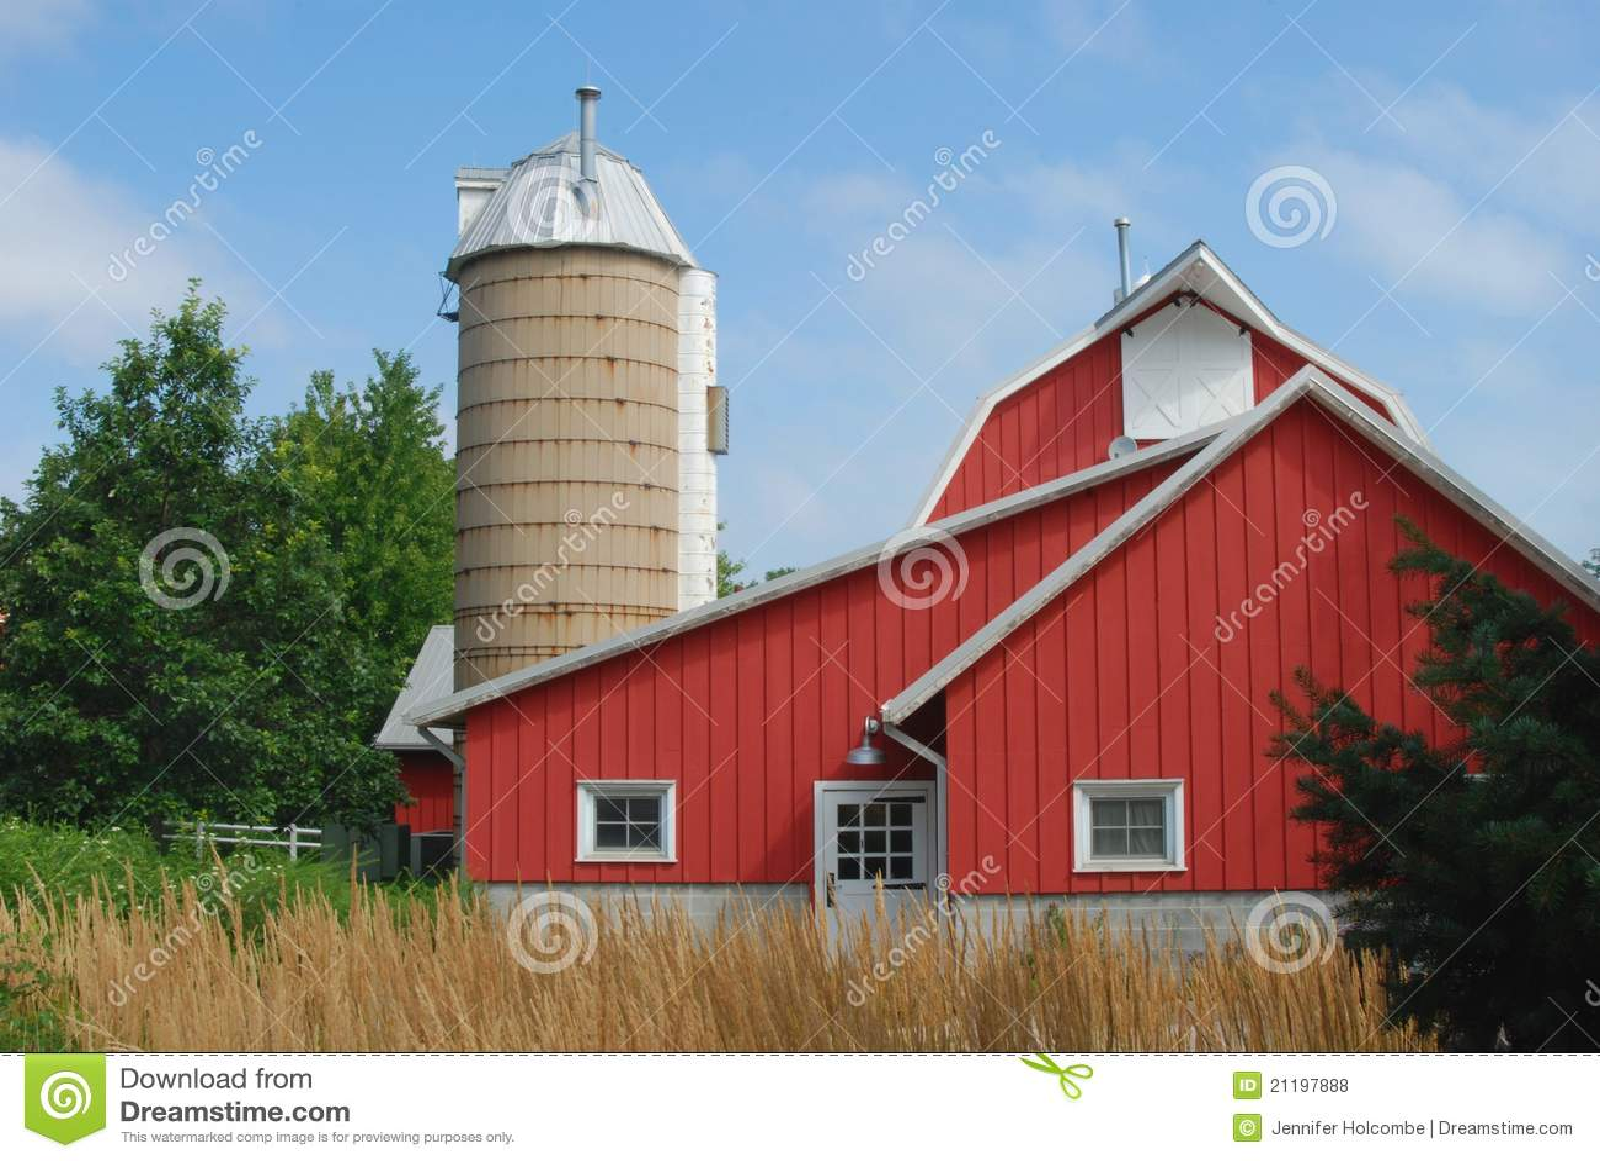 A quaint traditional farmstead